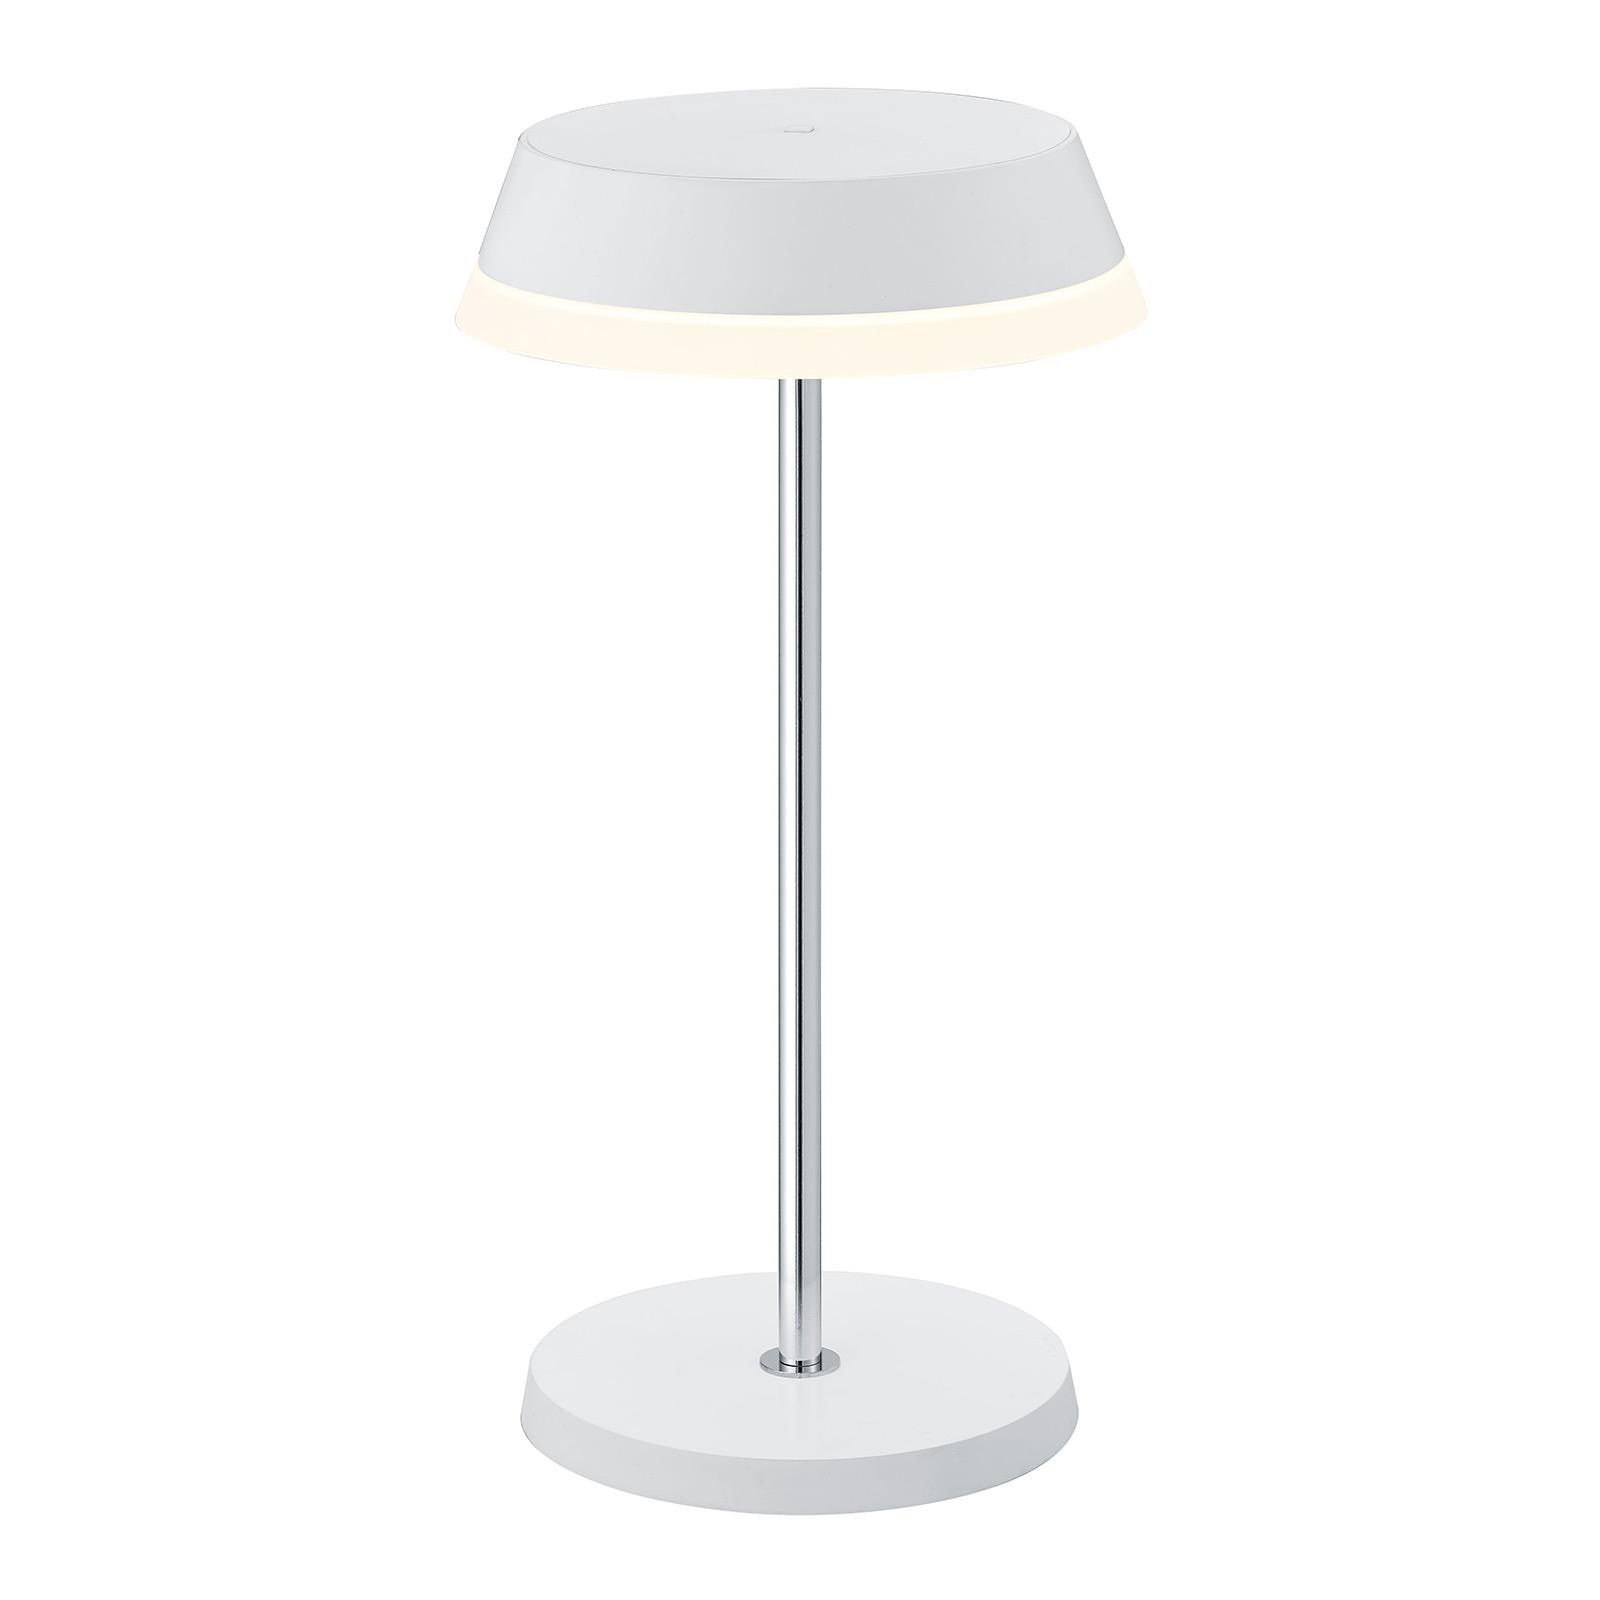 B-Leuchten Joy LED tafellamp met accu wit